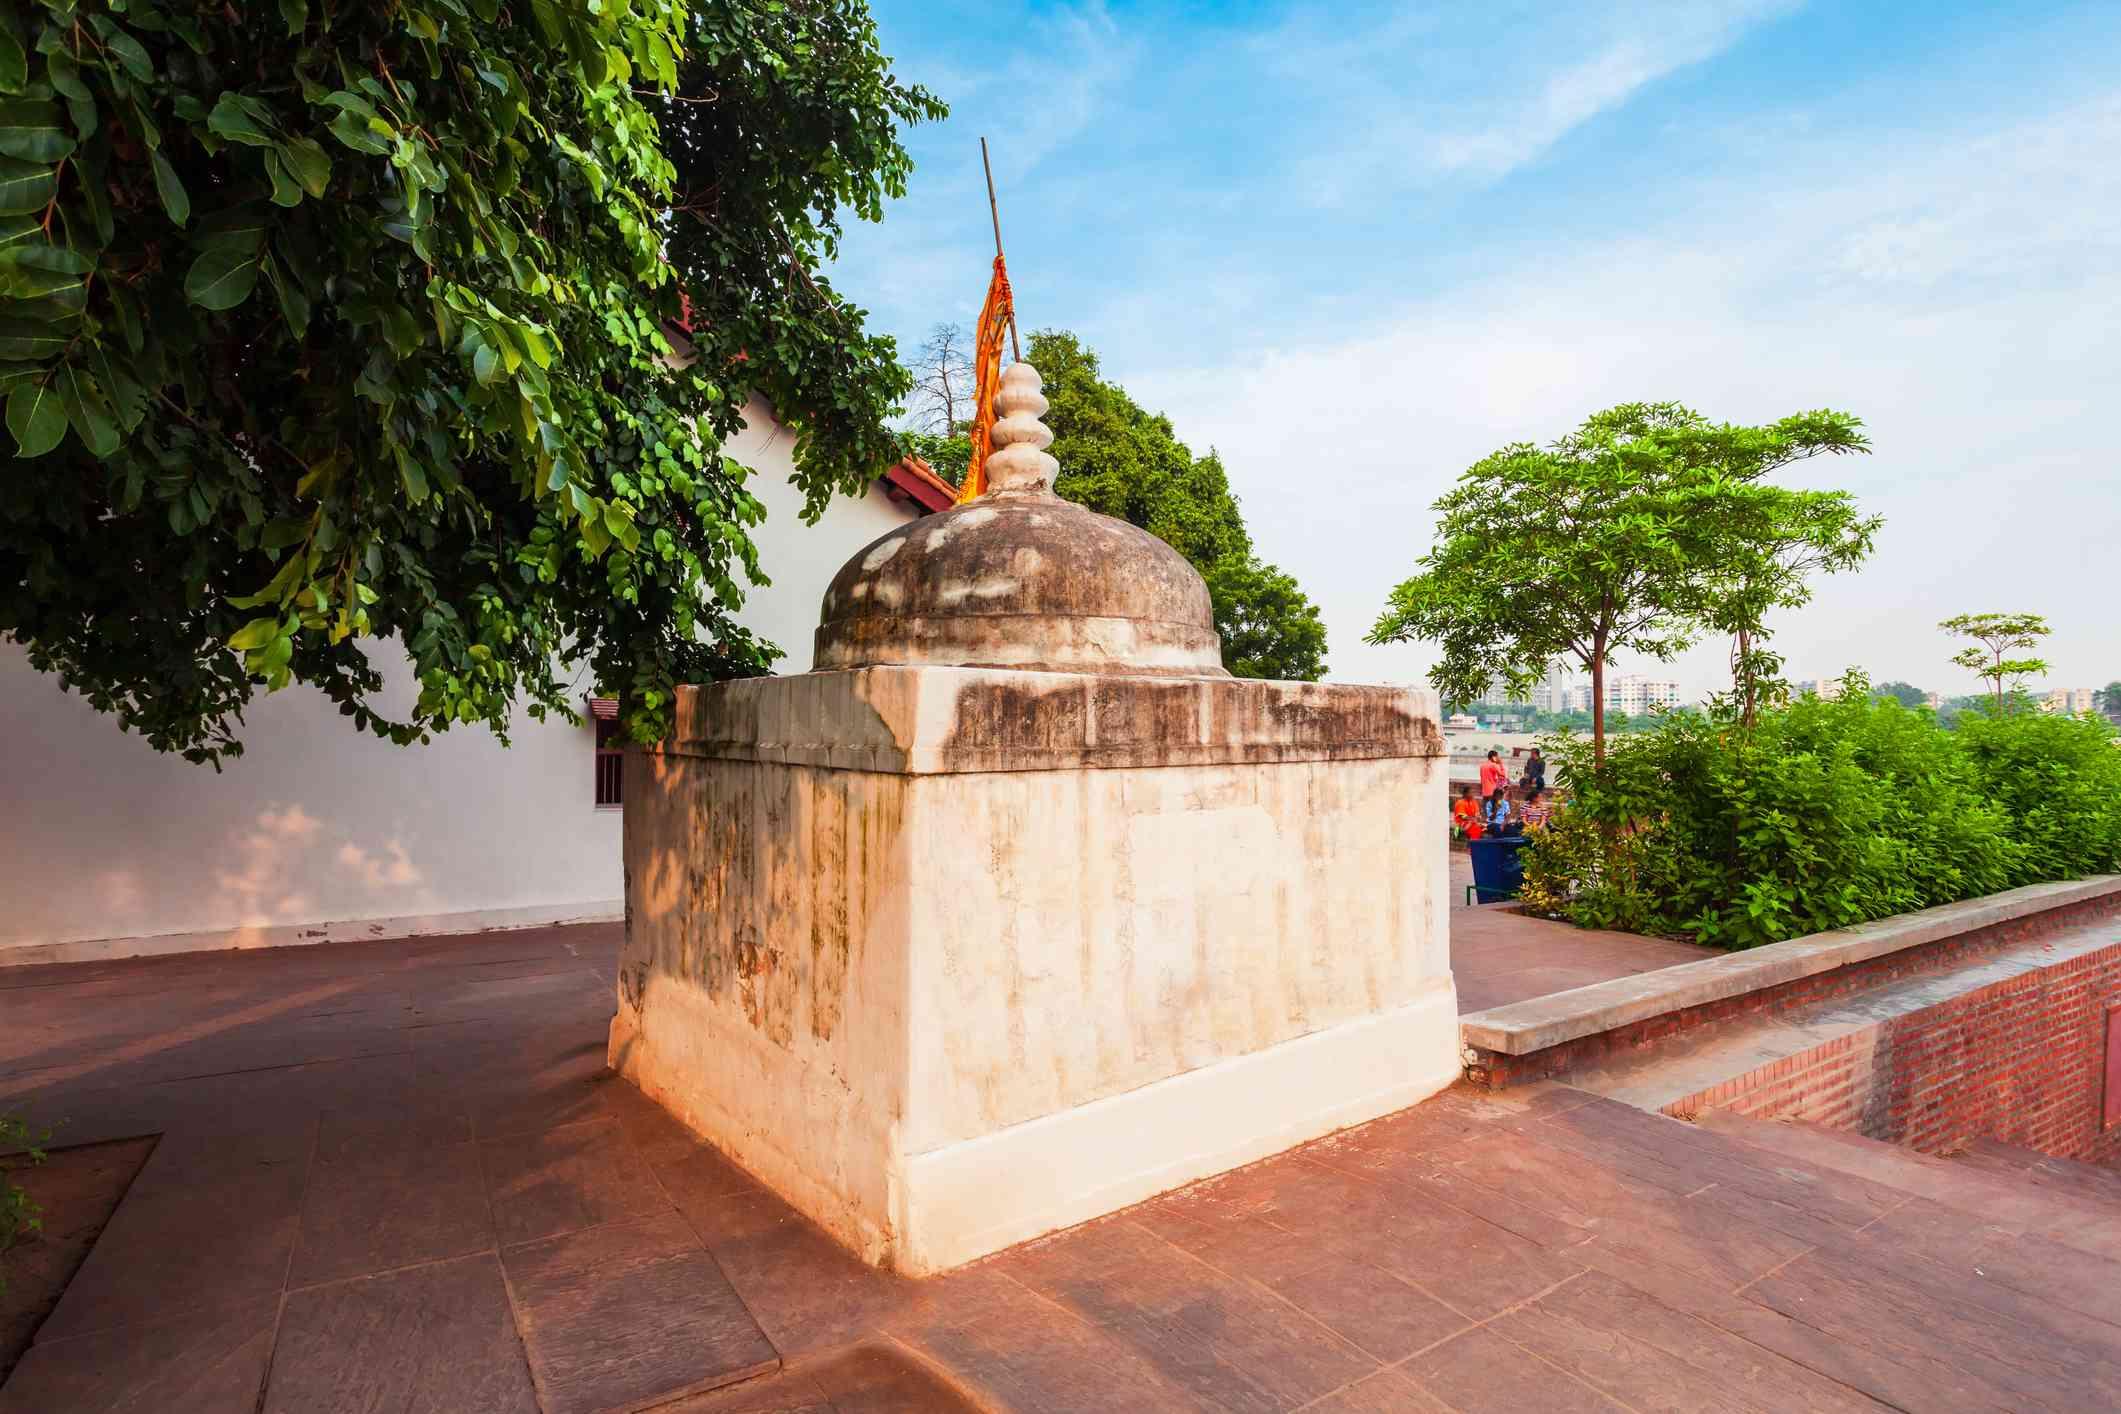 Sabarmati Gandhi Ashram in Ahmedabad